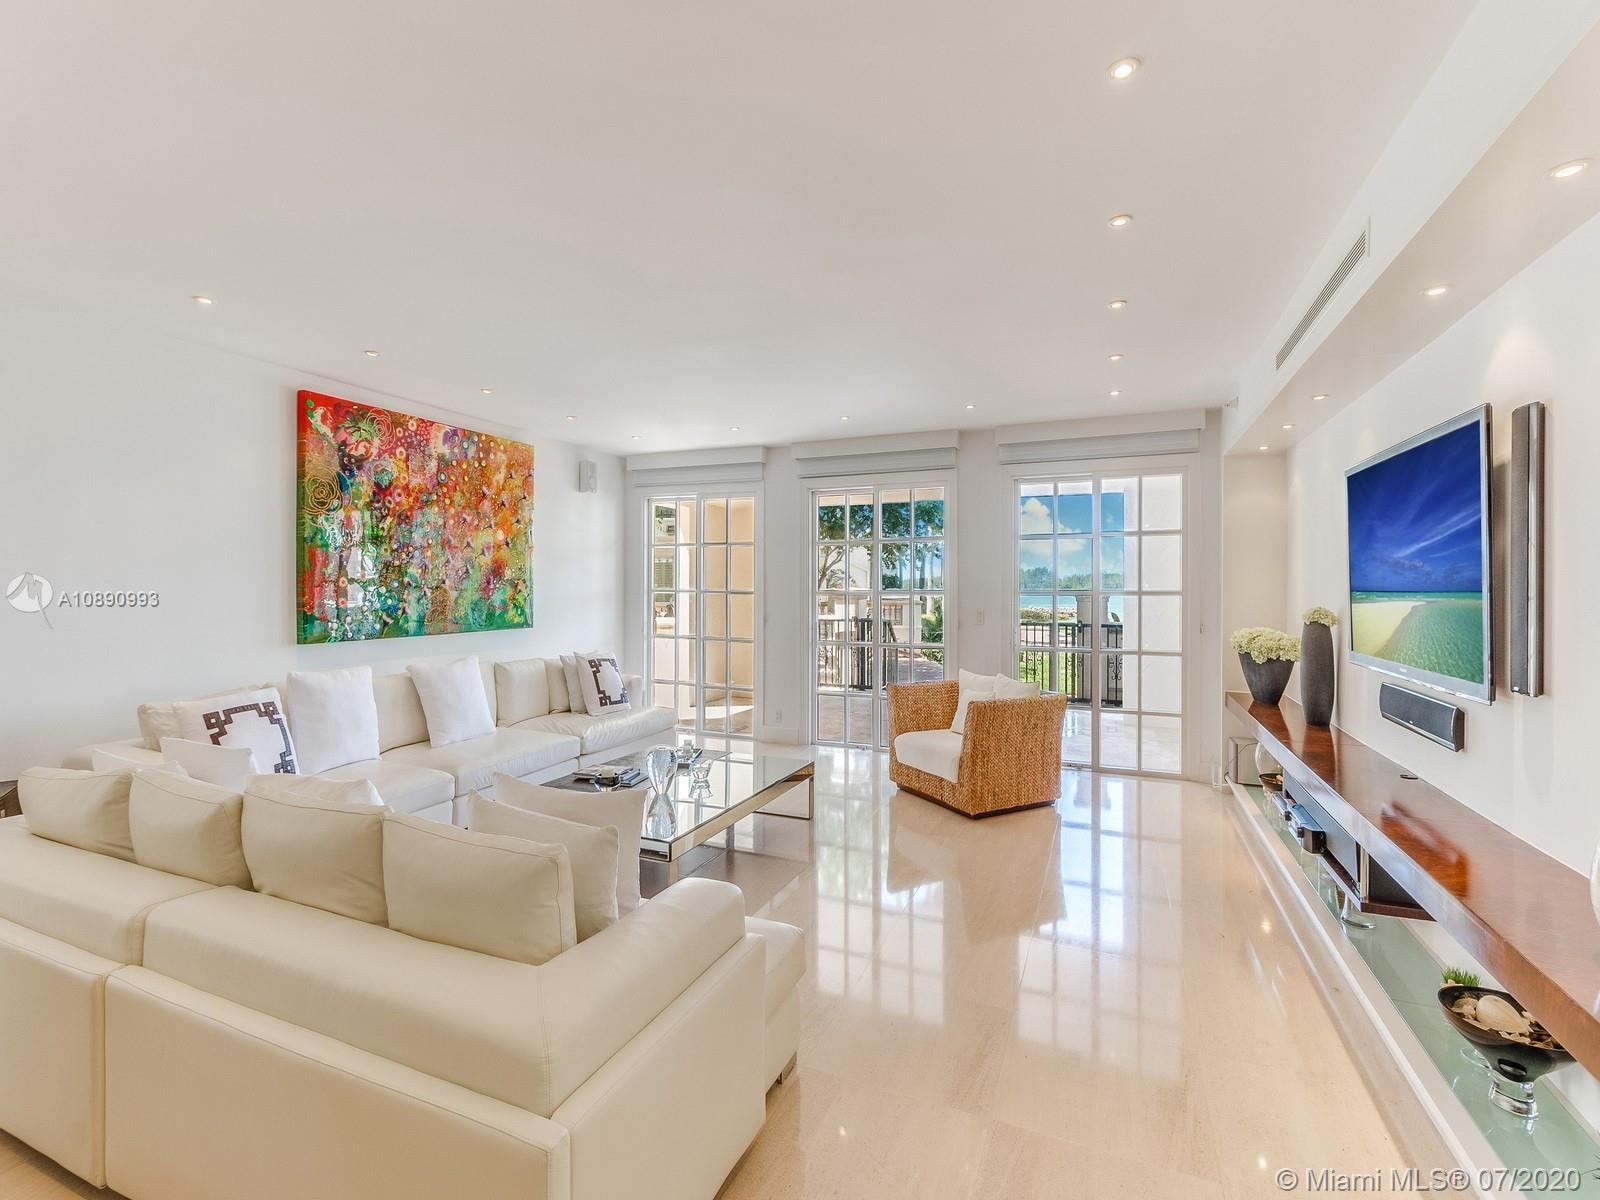 Real Estate Photo A10890993